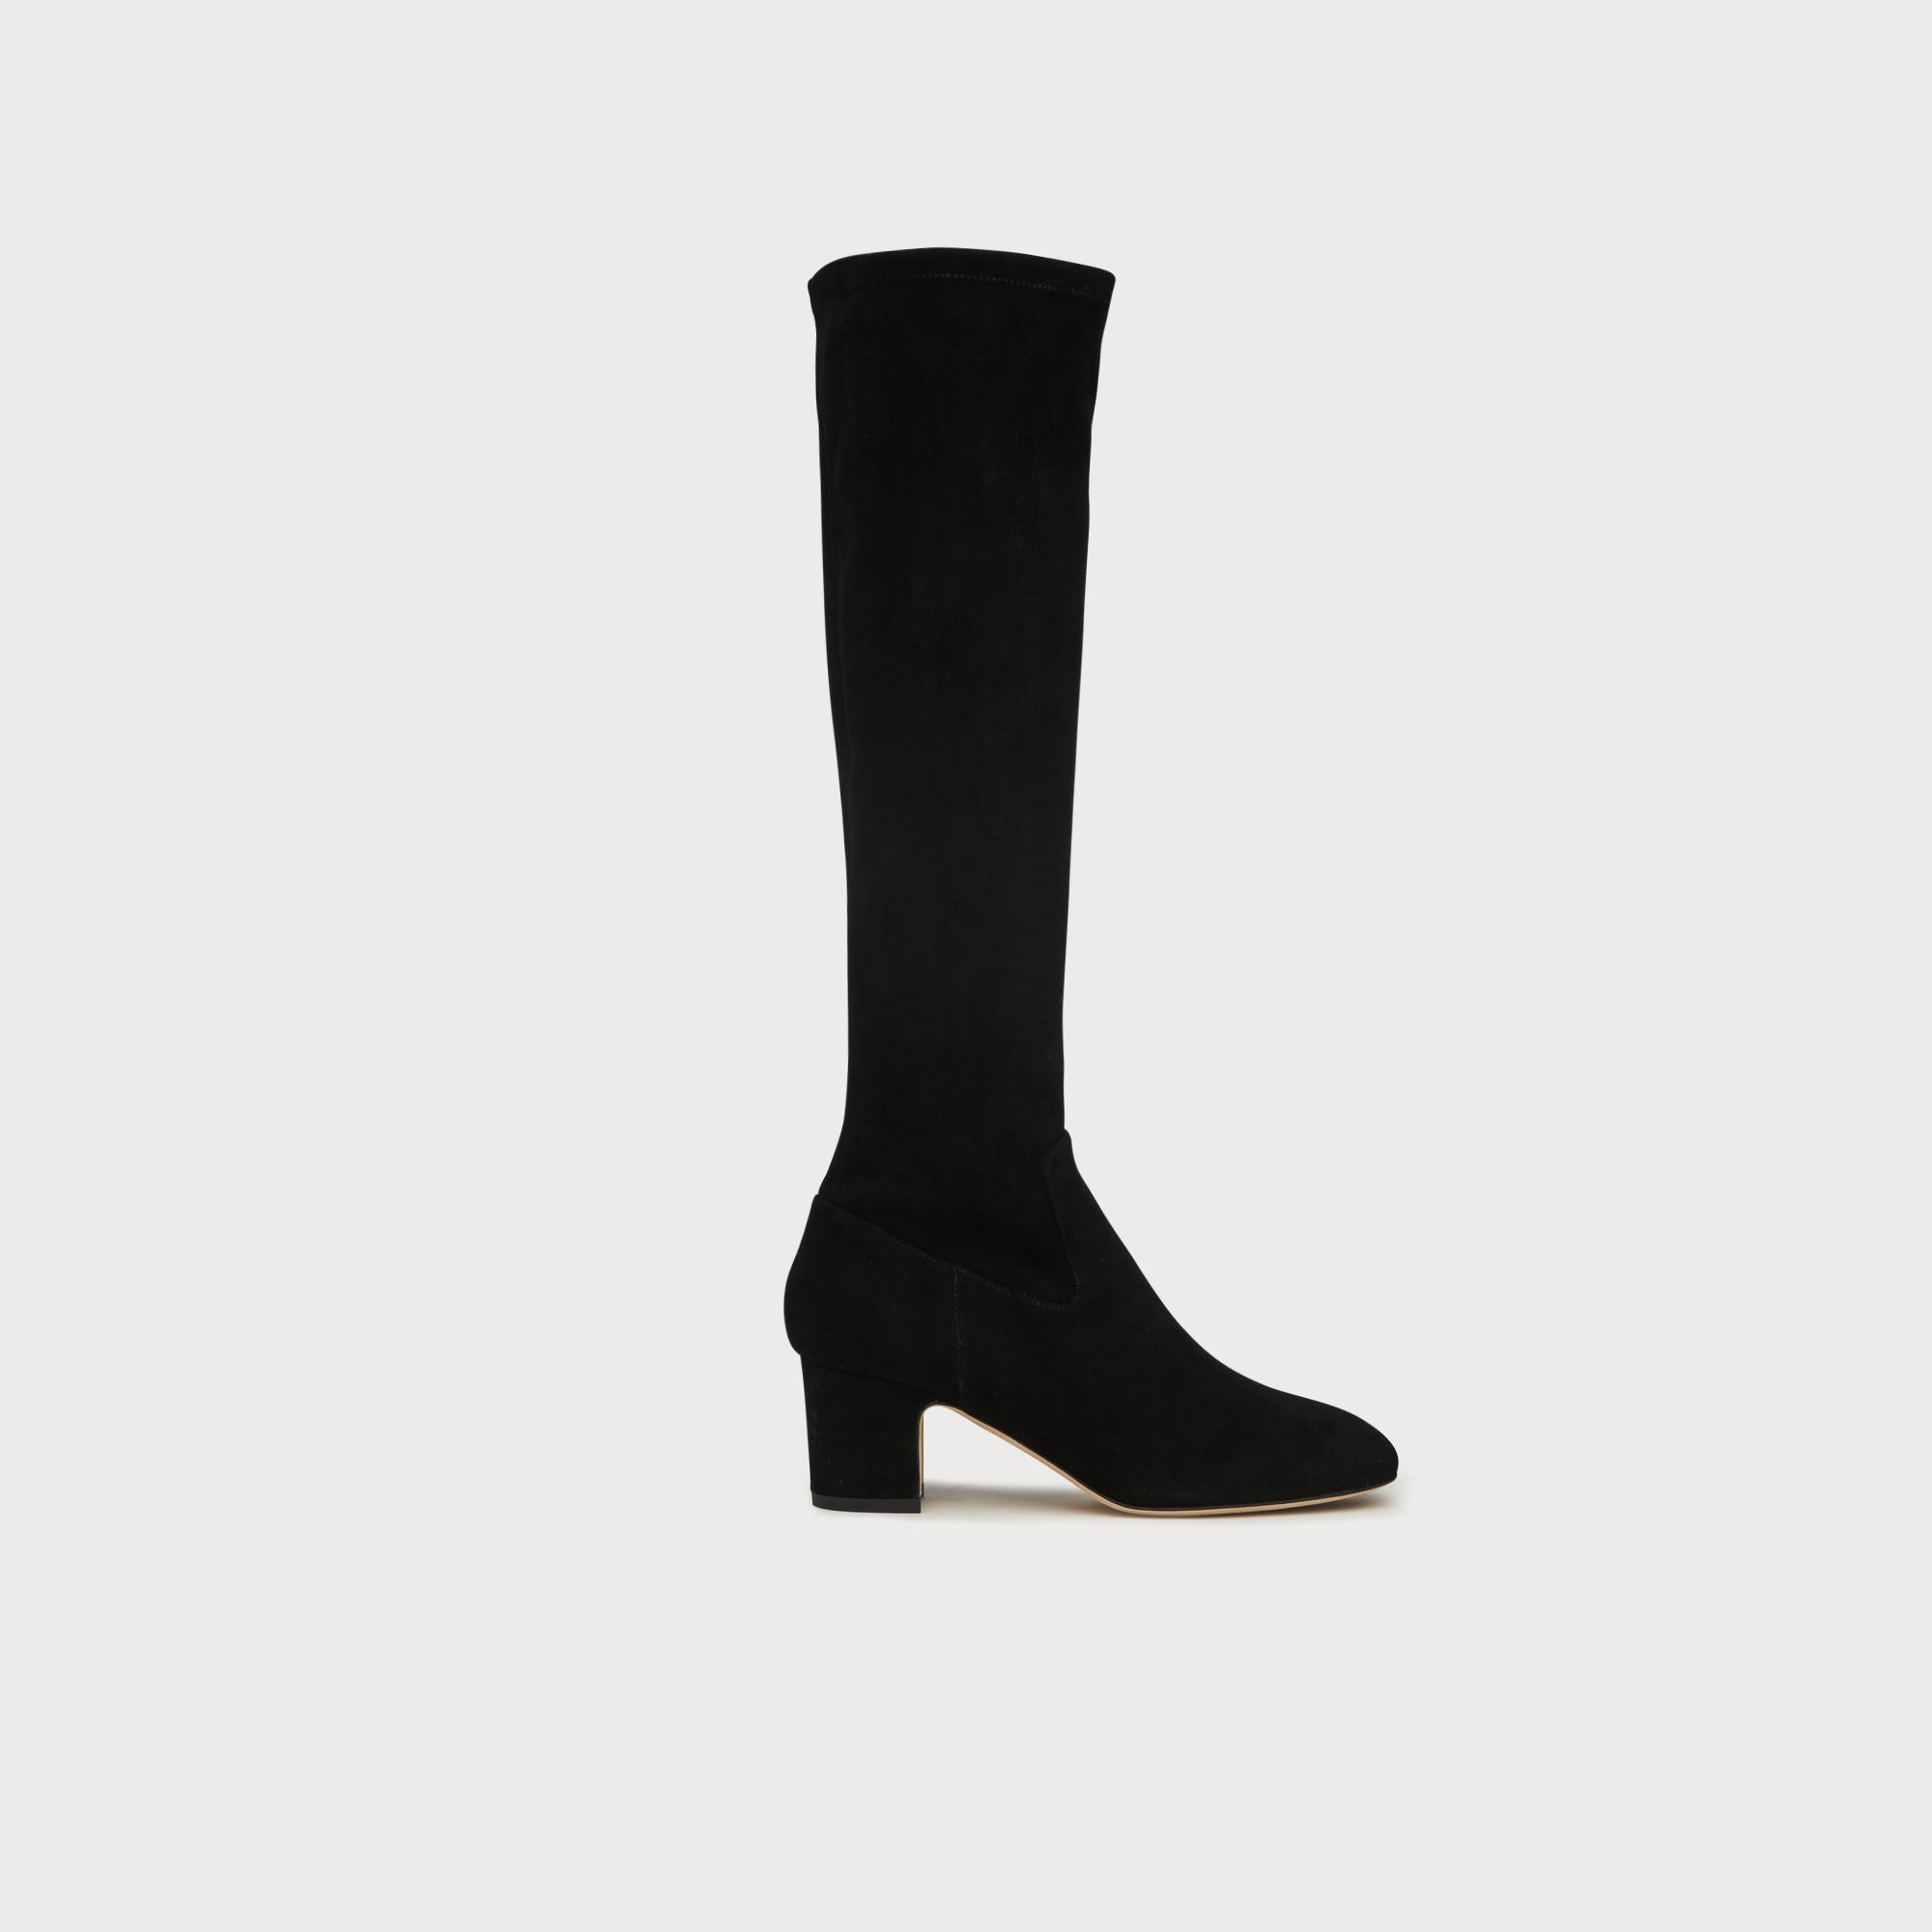 dce7ab871 Kiran Black Suede Knee Boots | Shoes | L.K.Bennett